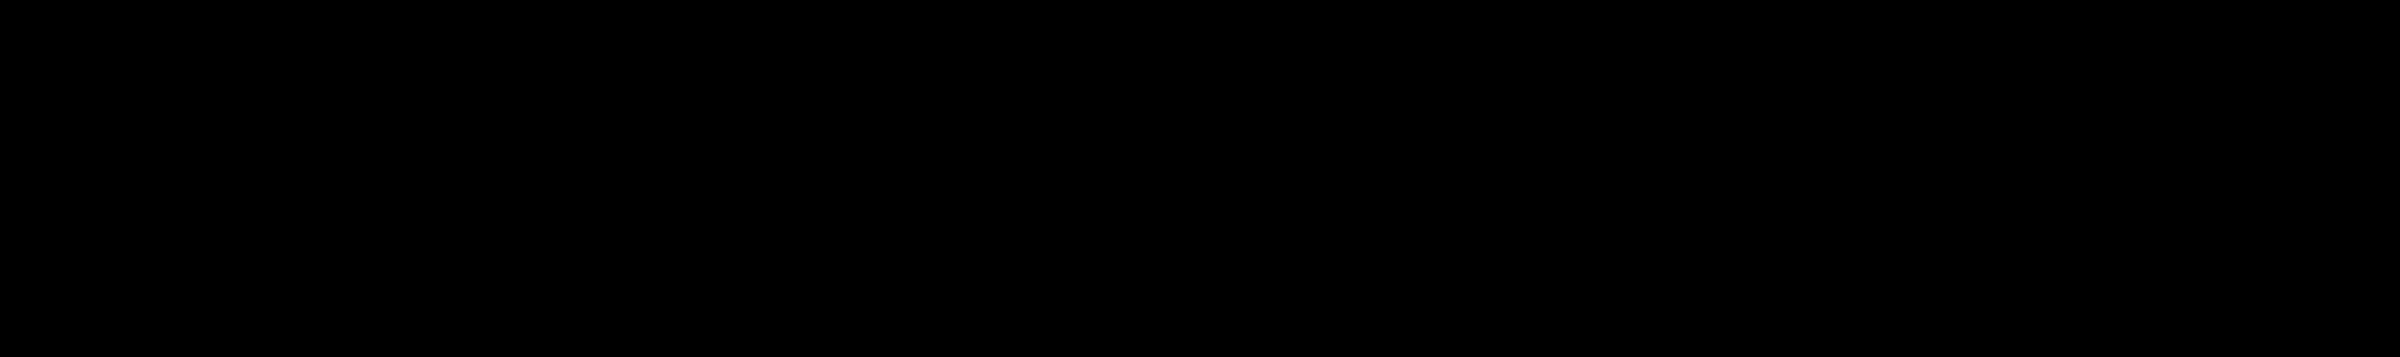 FAST COMPANY Logo PNG Transparent & SVG Vector.